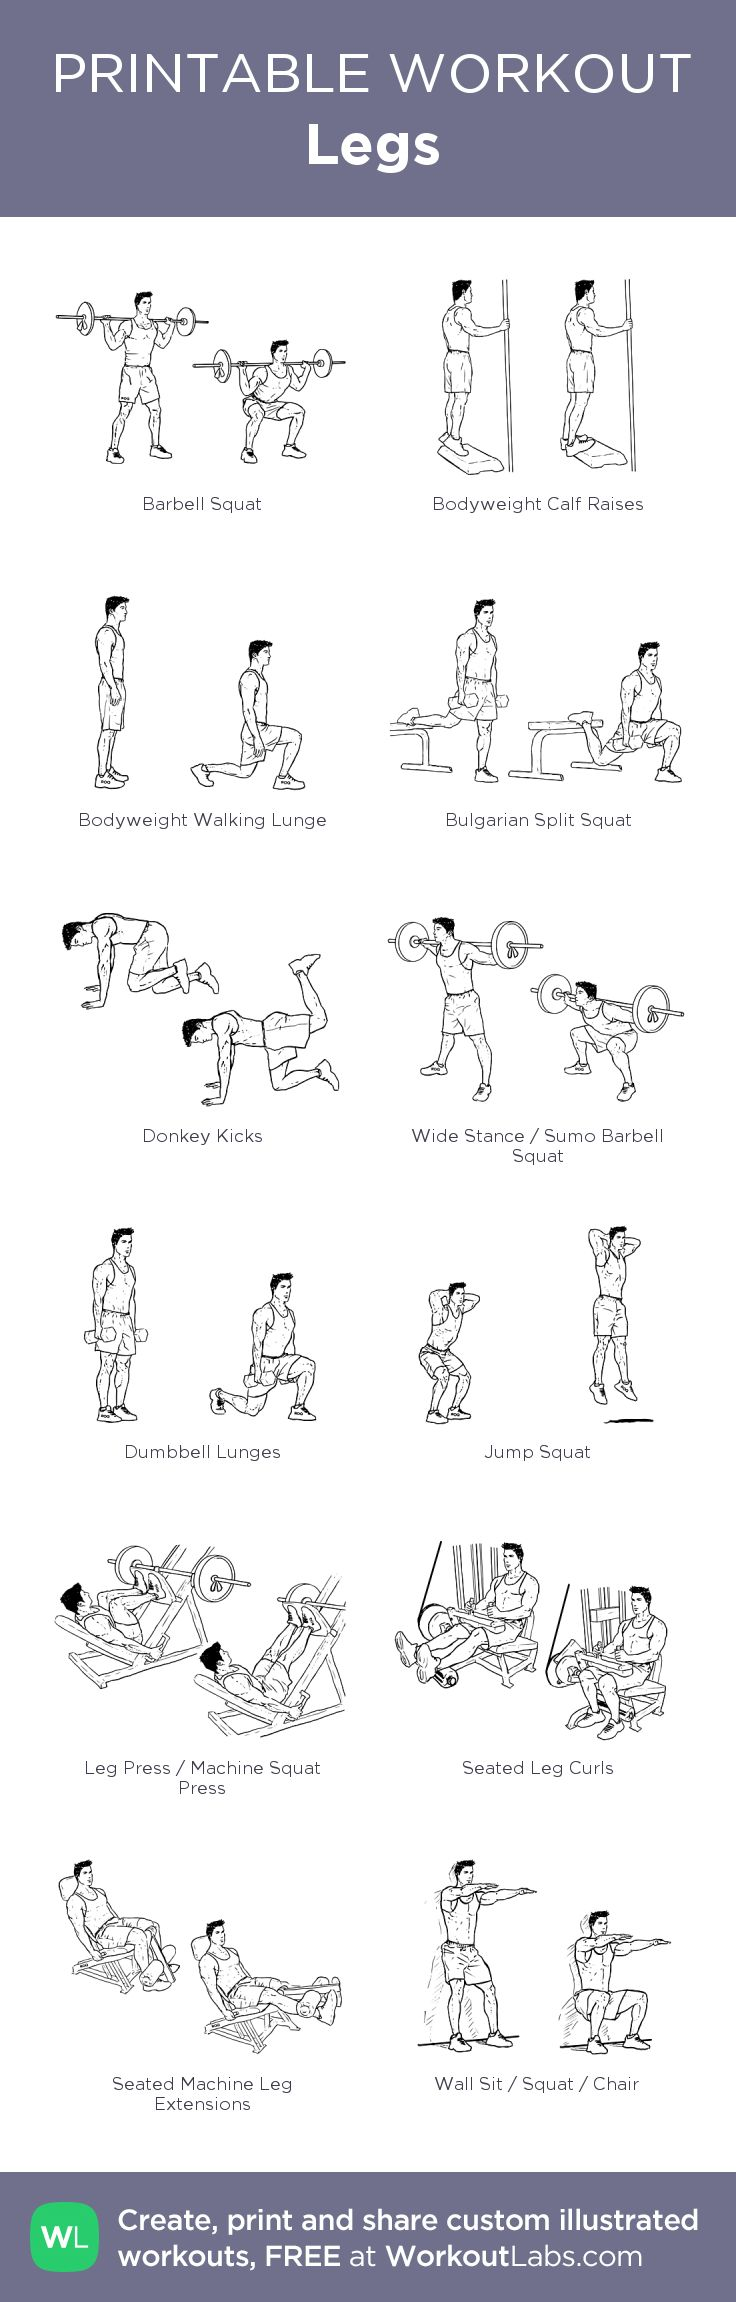 Best 25+ Smith machine workout ideas on Pinterest | Smith ...